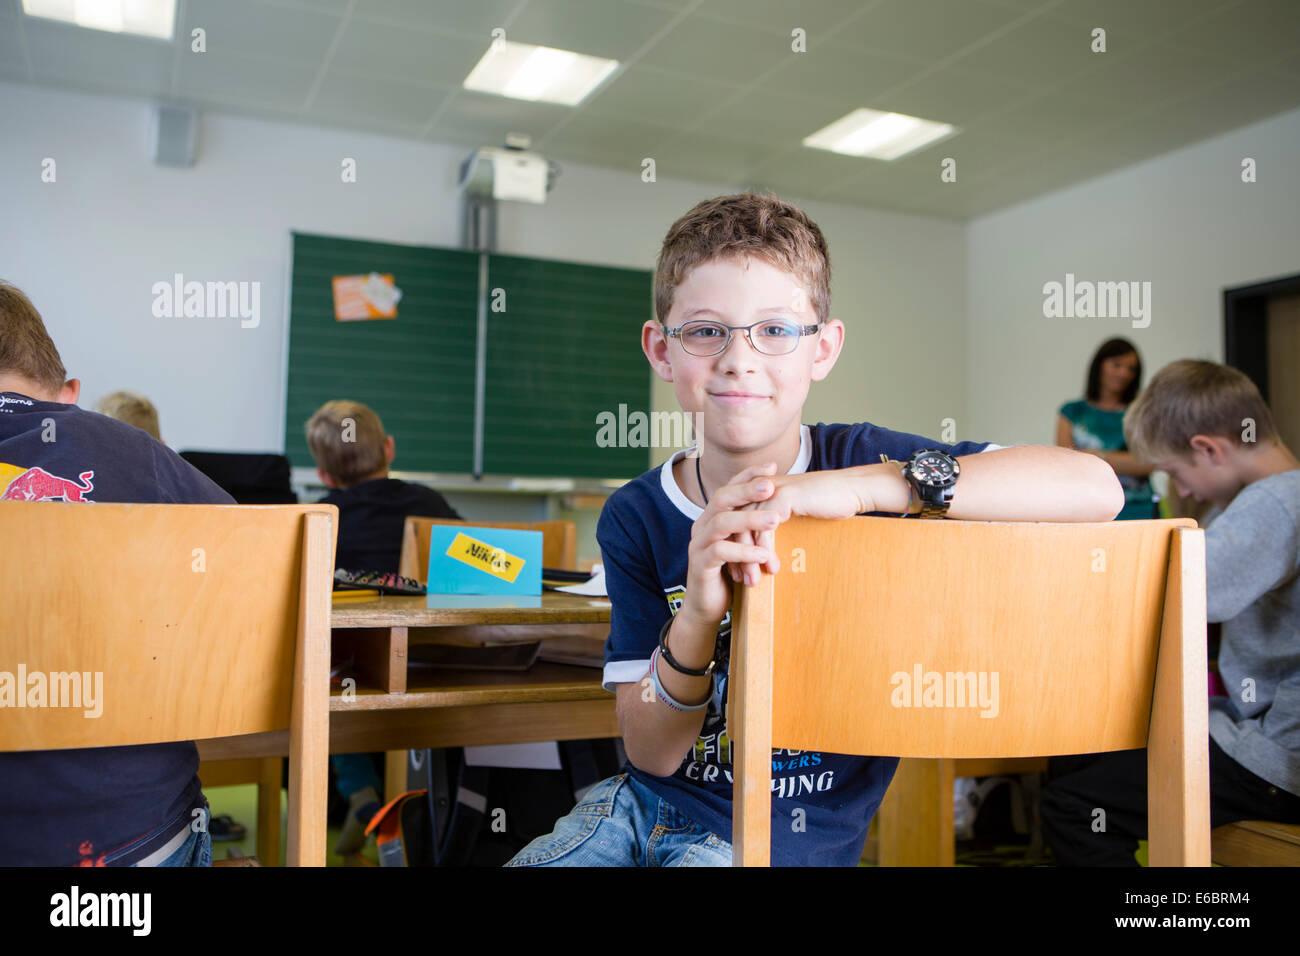 Boy in an elementary school class, Reith im Alpbachtal, Kufstein district, Tyrol, Austria - Stock Image